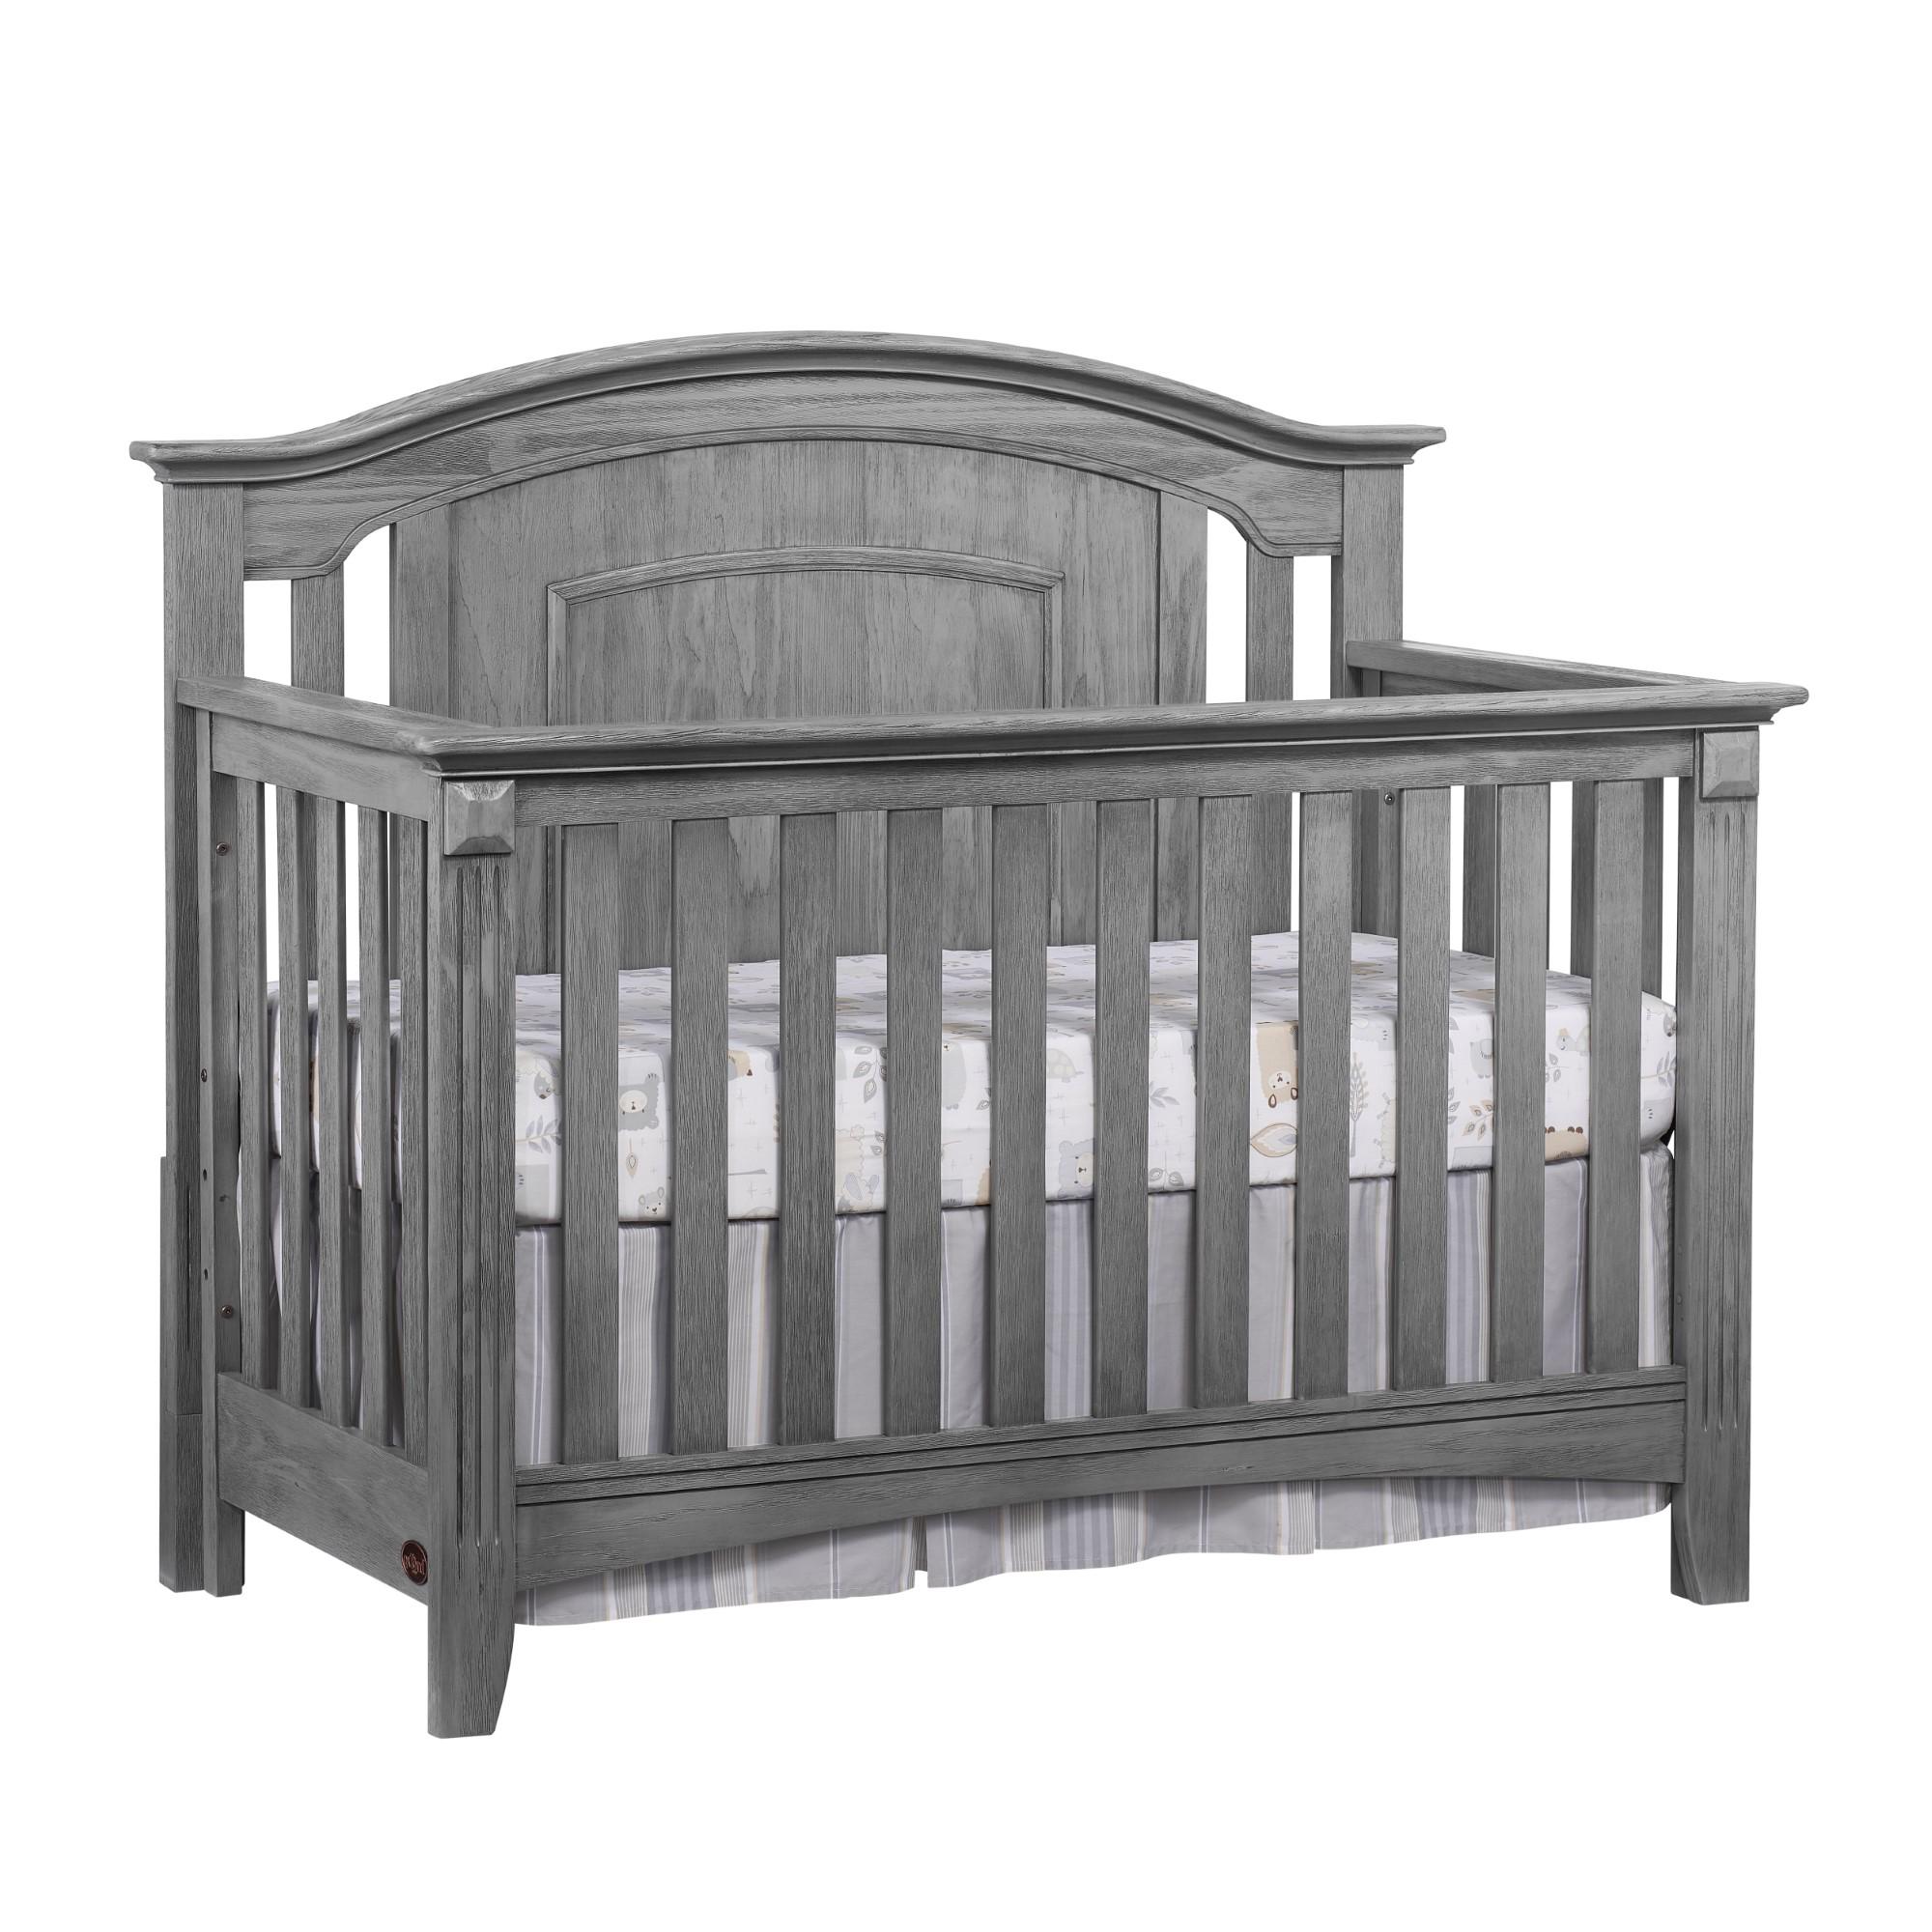 4 In 1 Convertible Crib Ozlo Baby